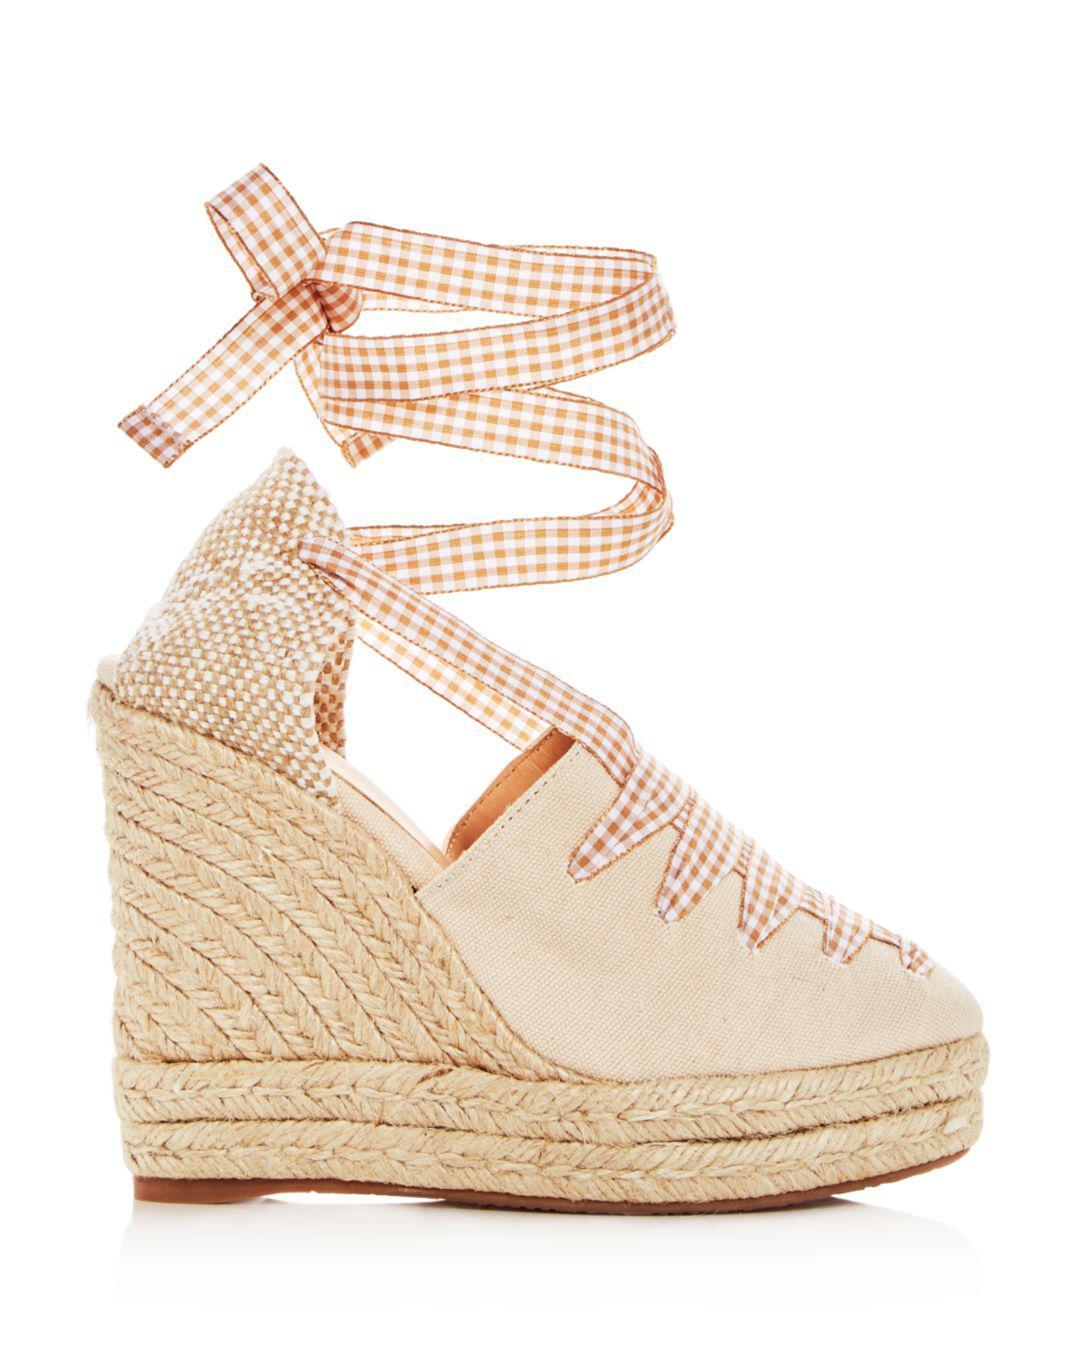 20b04d2e047e Lyst - Castaner Women s Lula Ankle Tie Platform Wedge Espadrille Sandals in  Natural